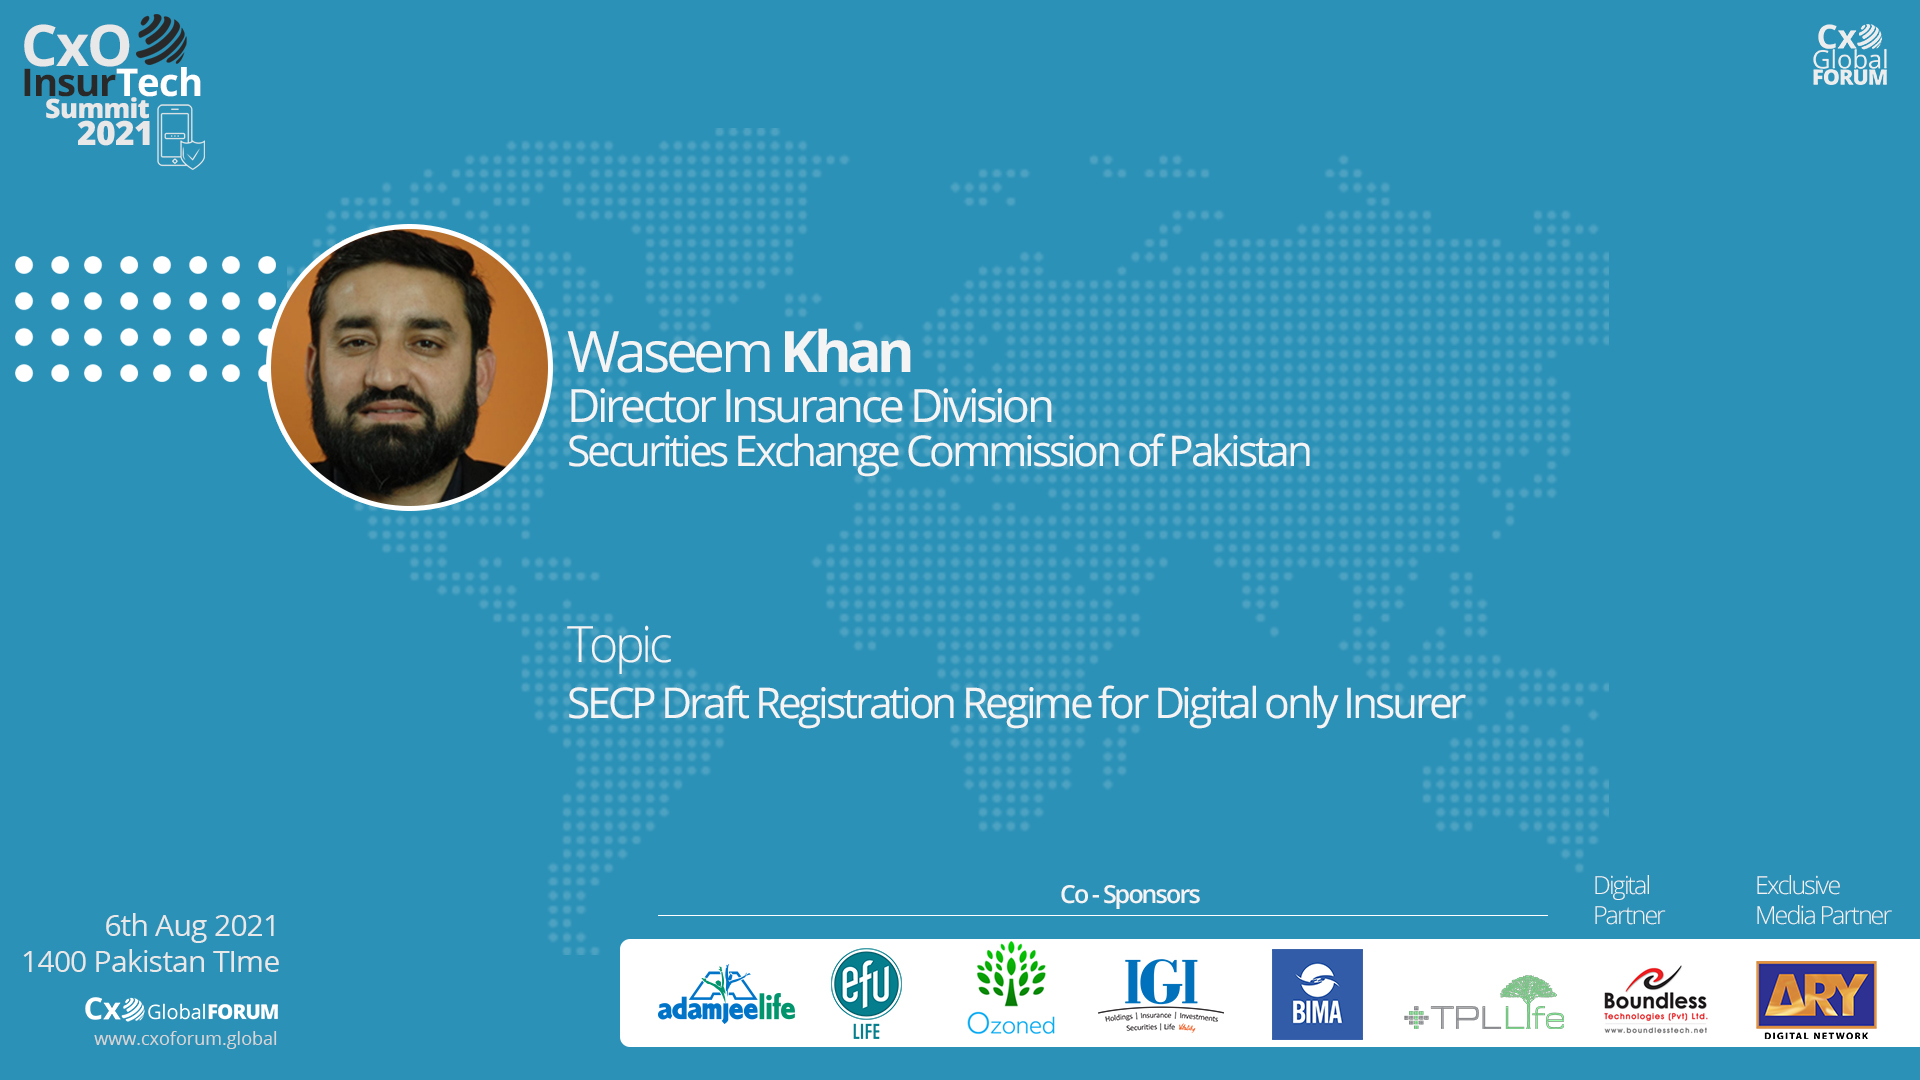 SECP Draft Registration Regime for Digital only Insurer